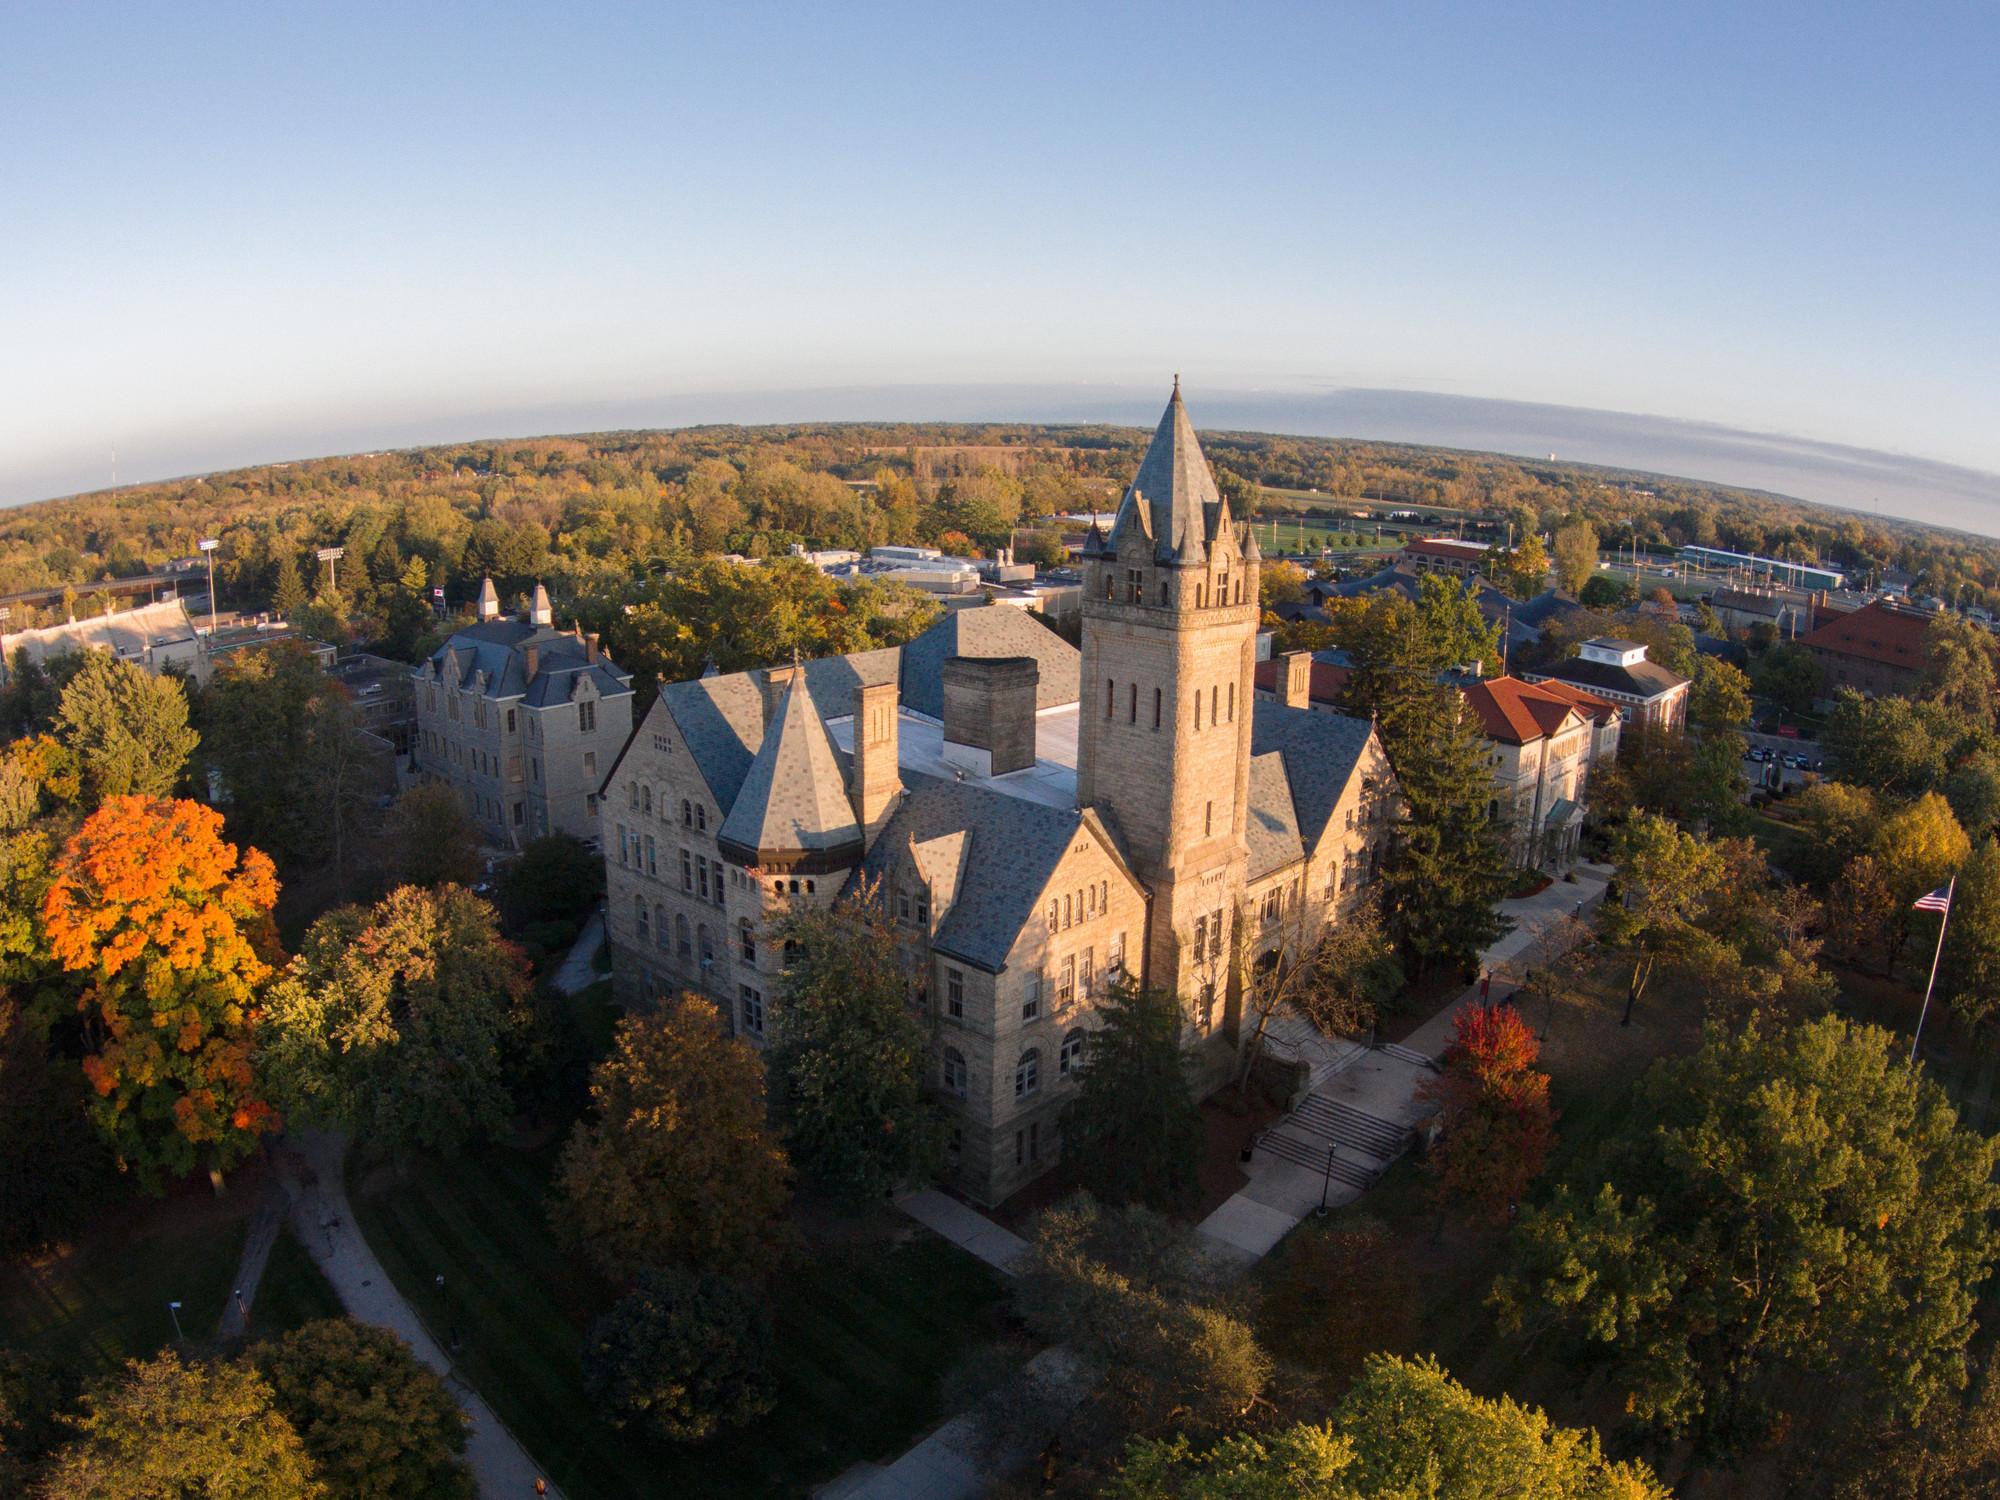 Ohio wesleyan university aerial image